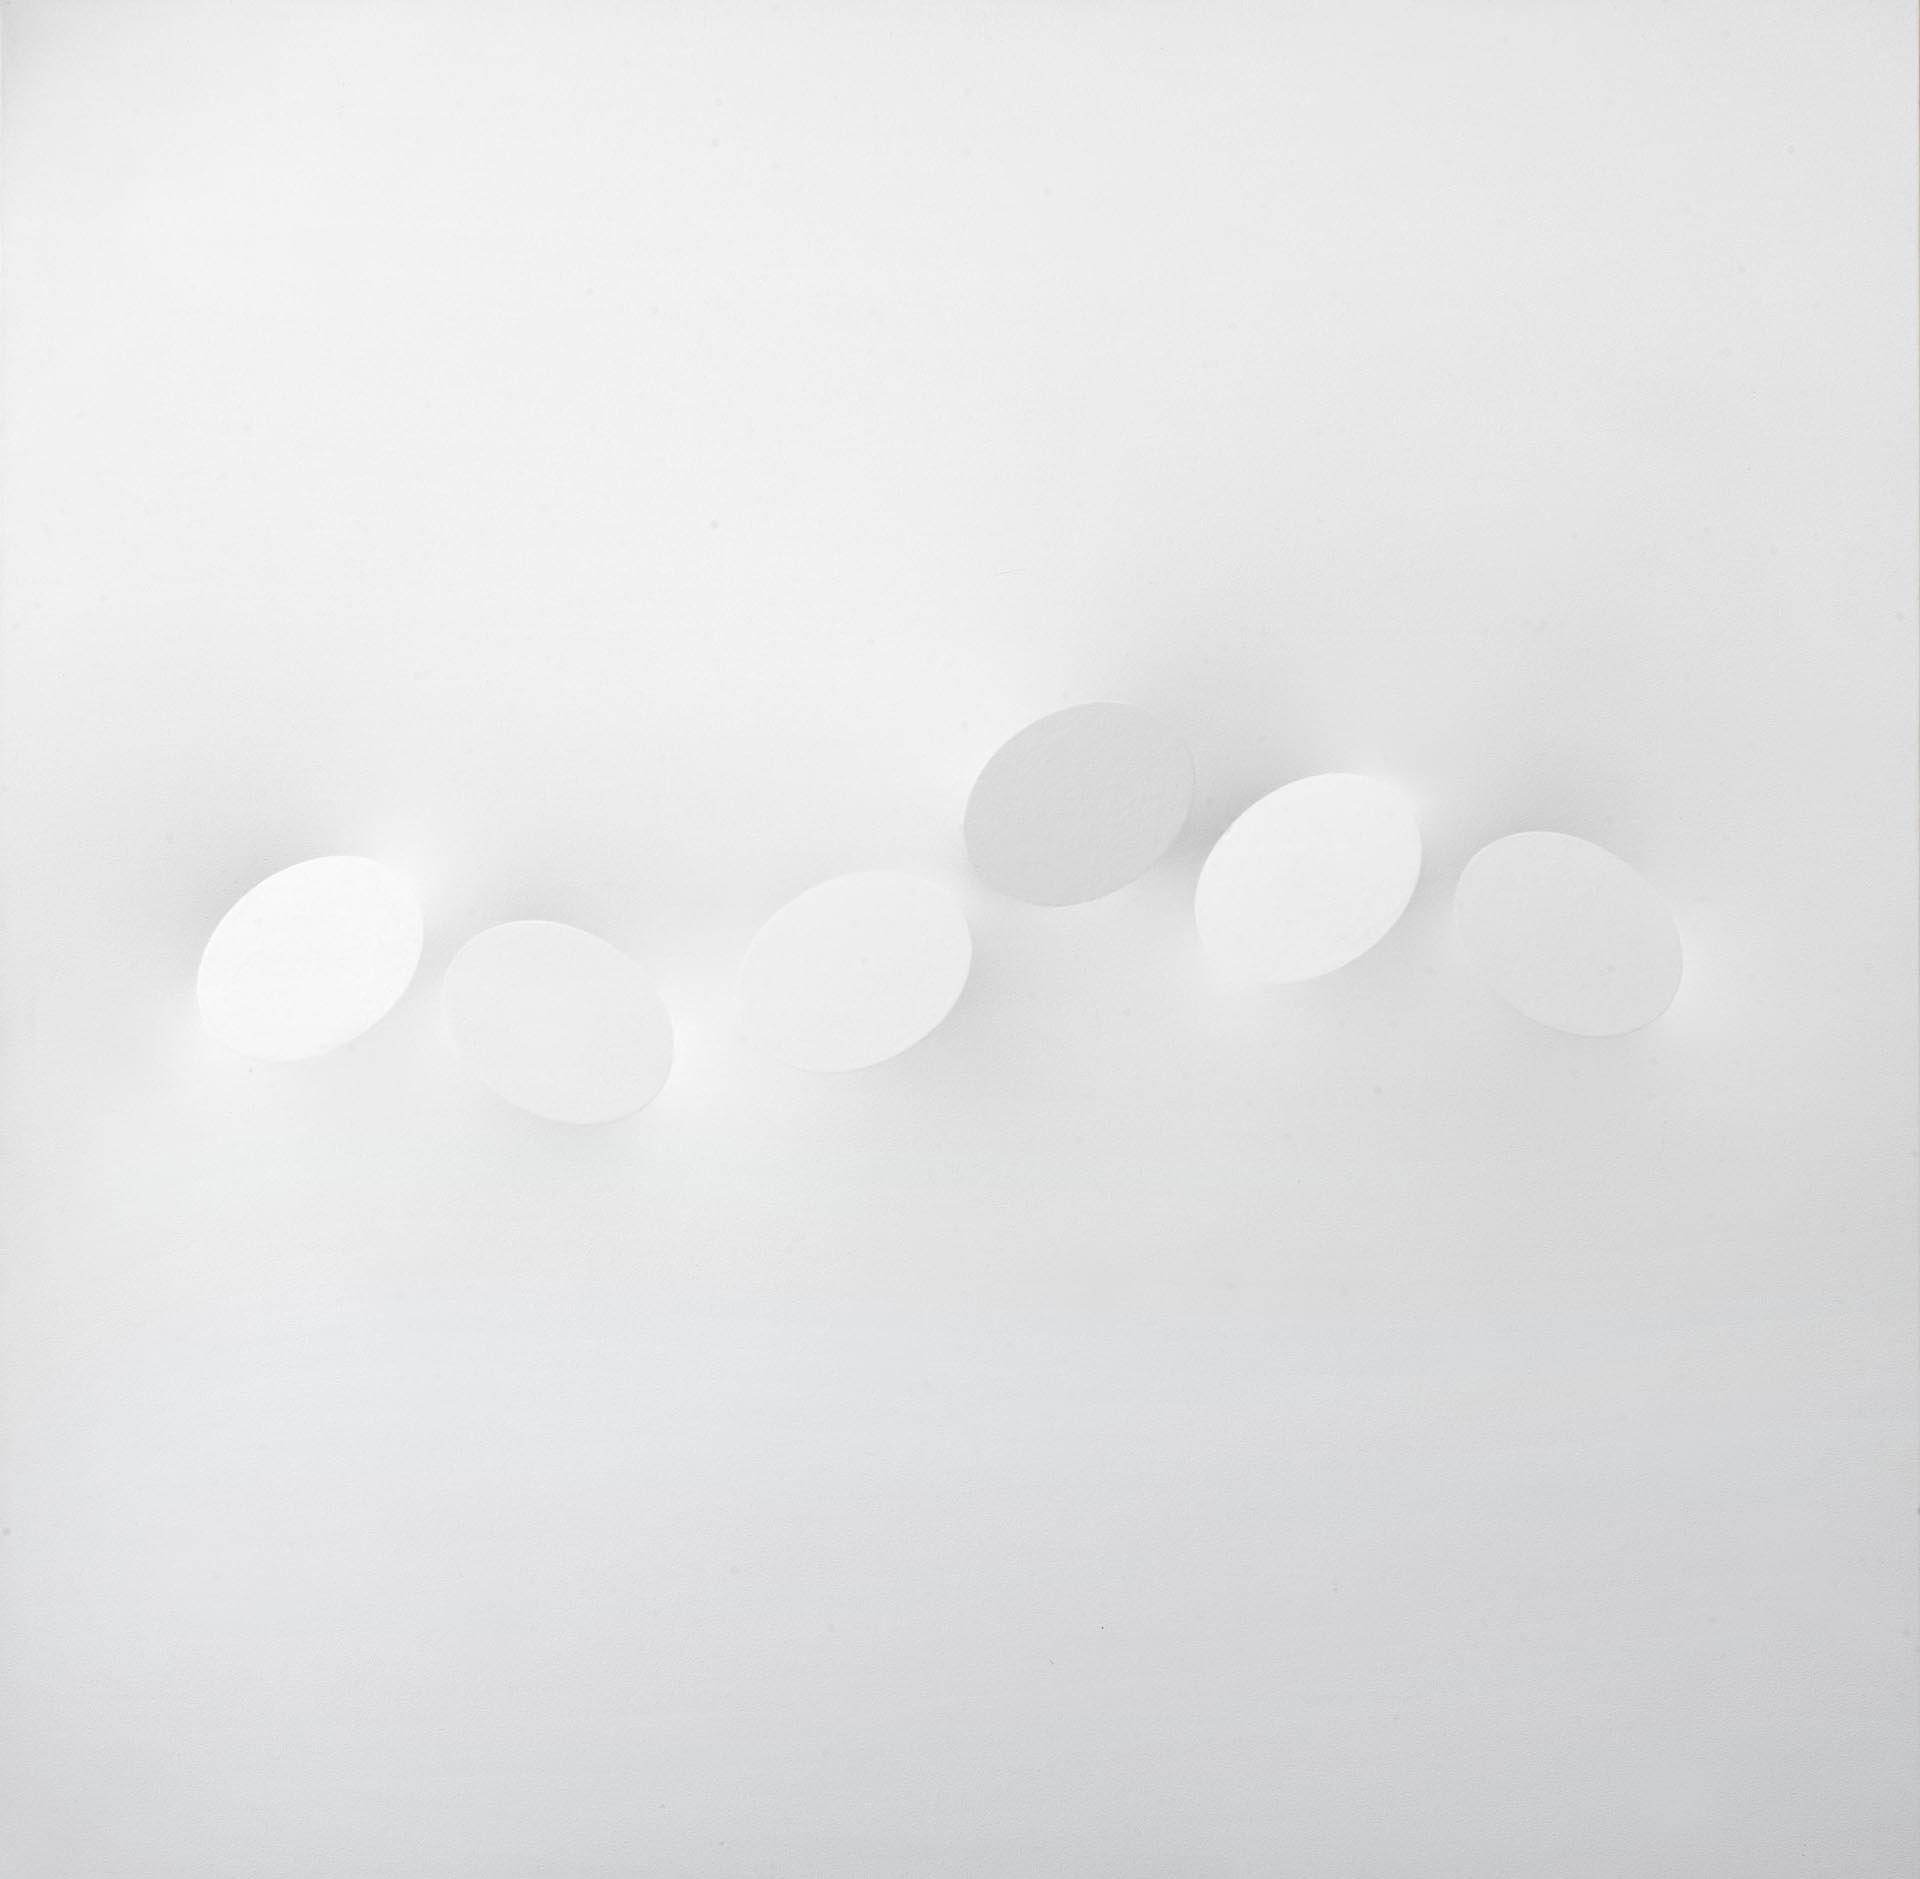 Simeti, Sei ovali bianchi, 2010, 150x150 cm